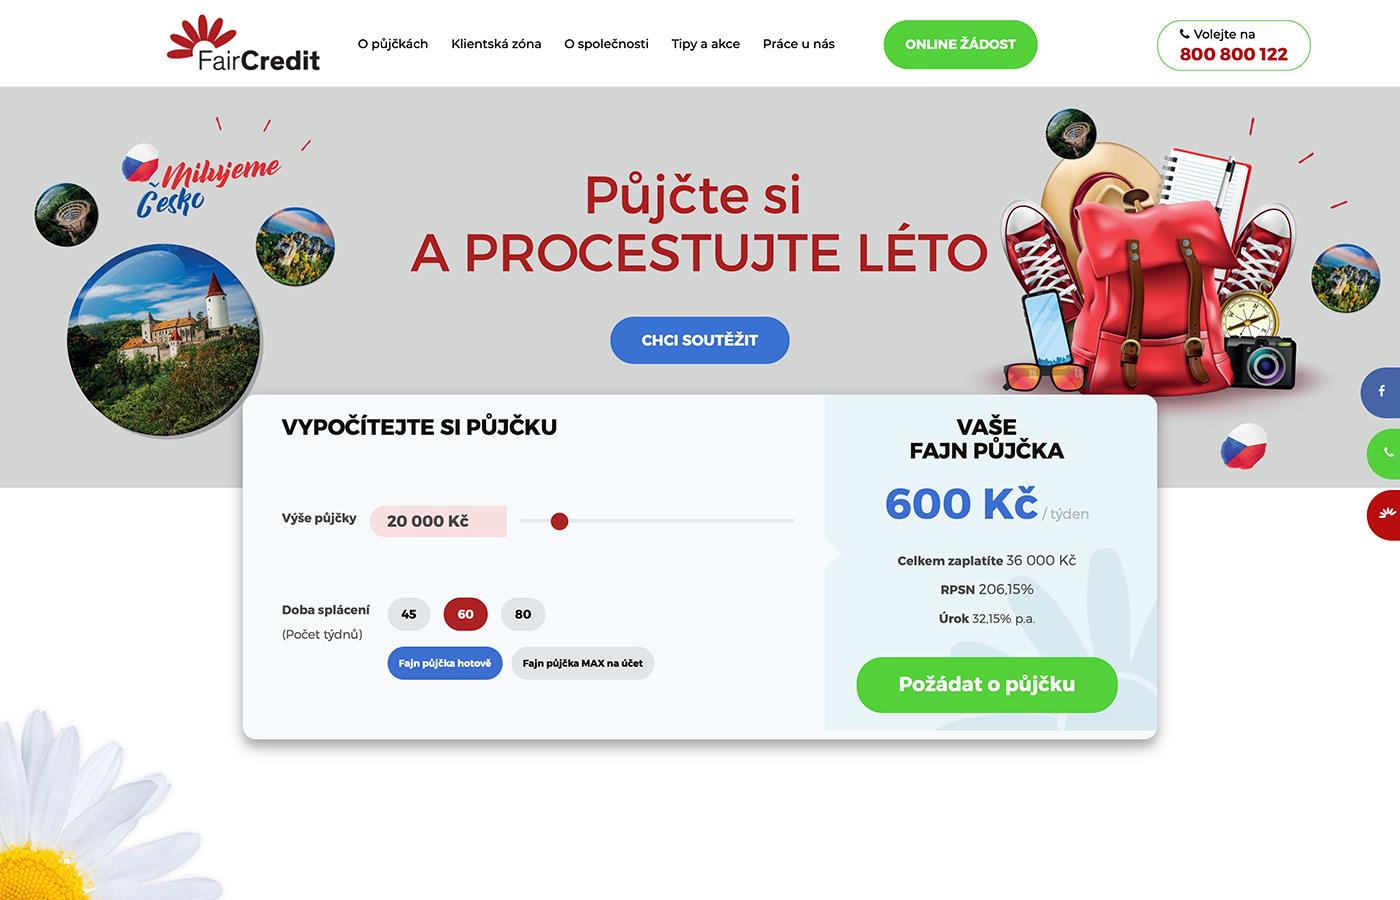 Webové stránky https://www.faircredit.cz